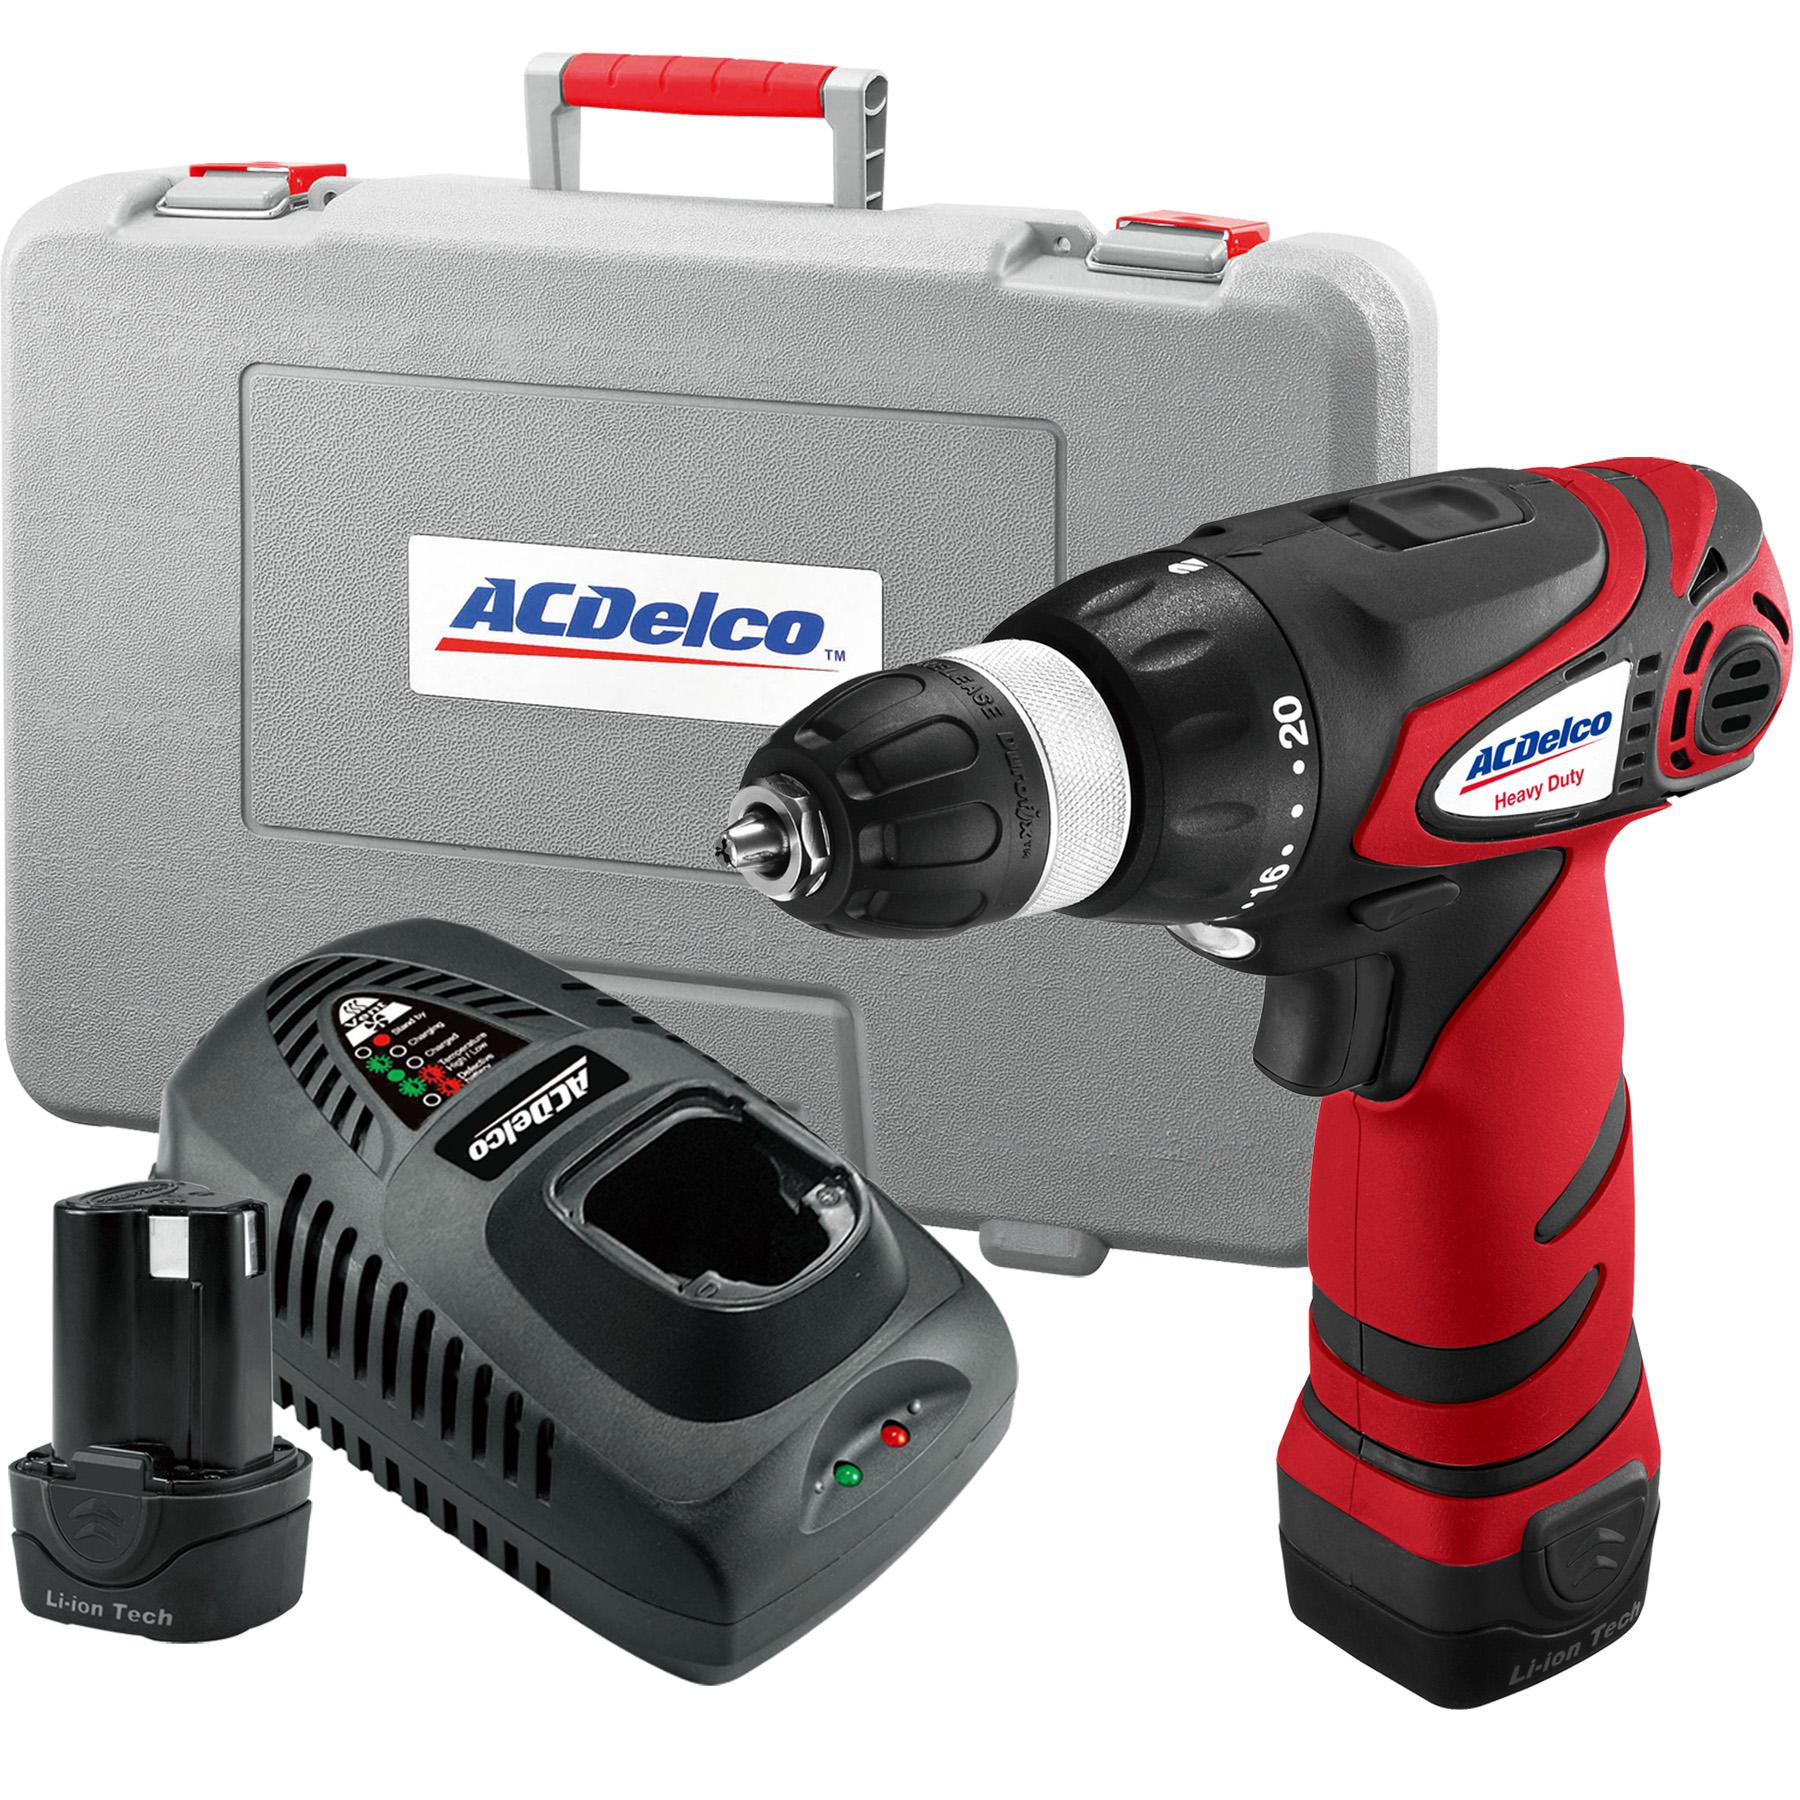 "ACDelco Tools Power Tool - ARD1296 Li-ion 12V 3/8"" Drill"